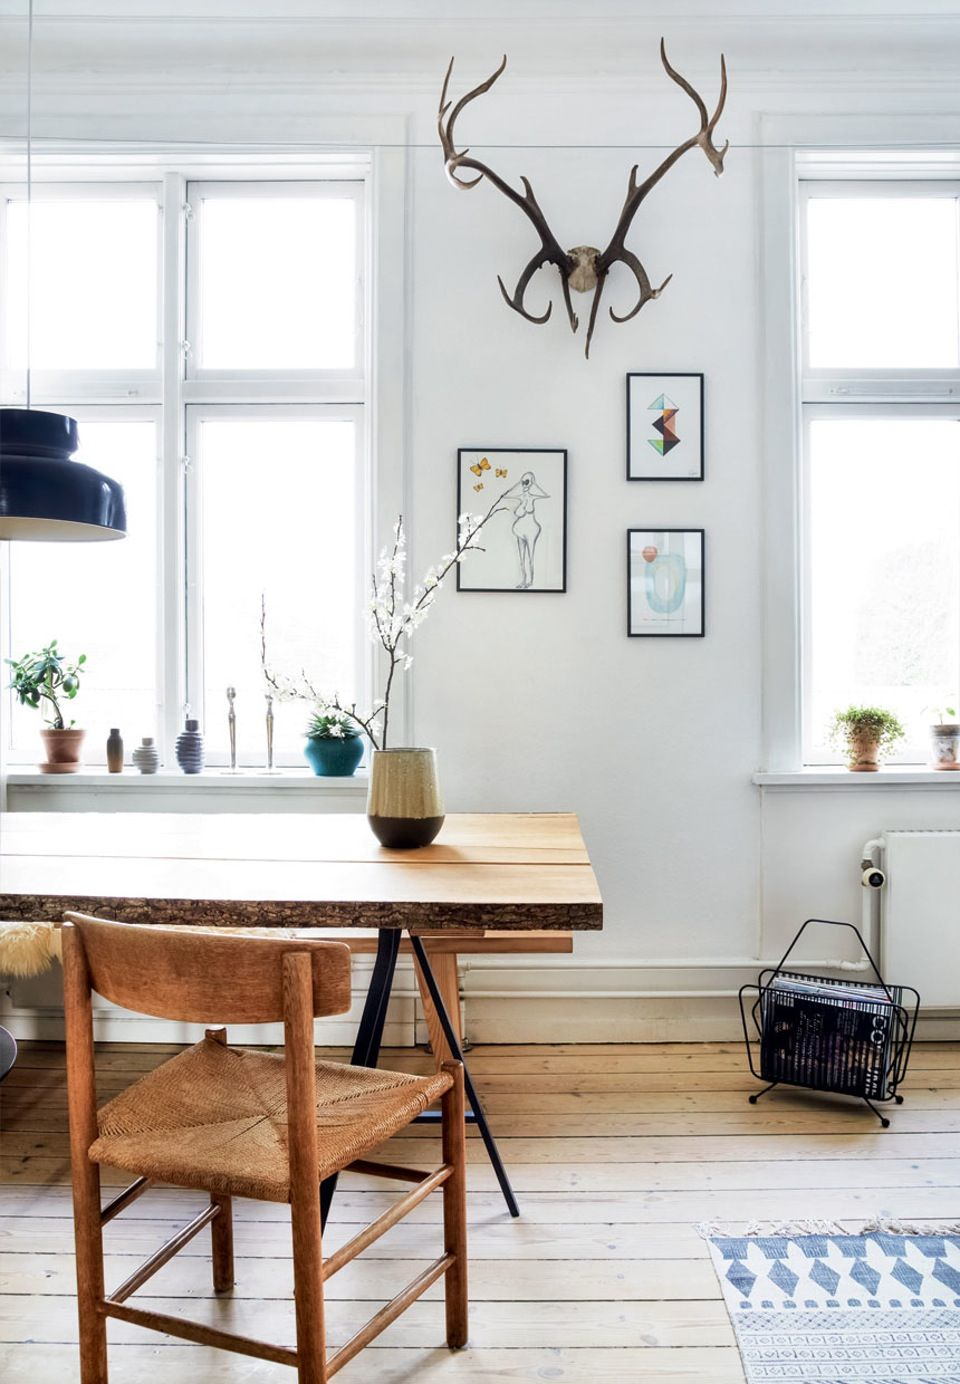 Diy home decor also mine ting  gerne  re gamle og sk ve ideas and projects rh pinterest